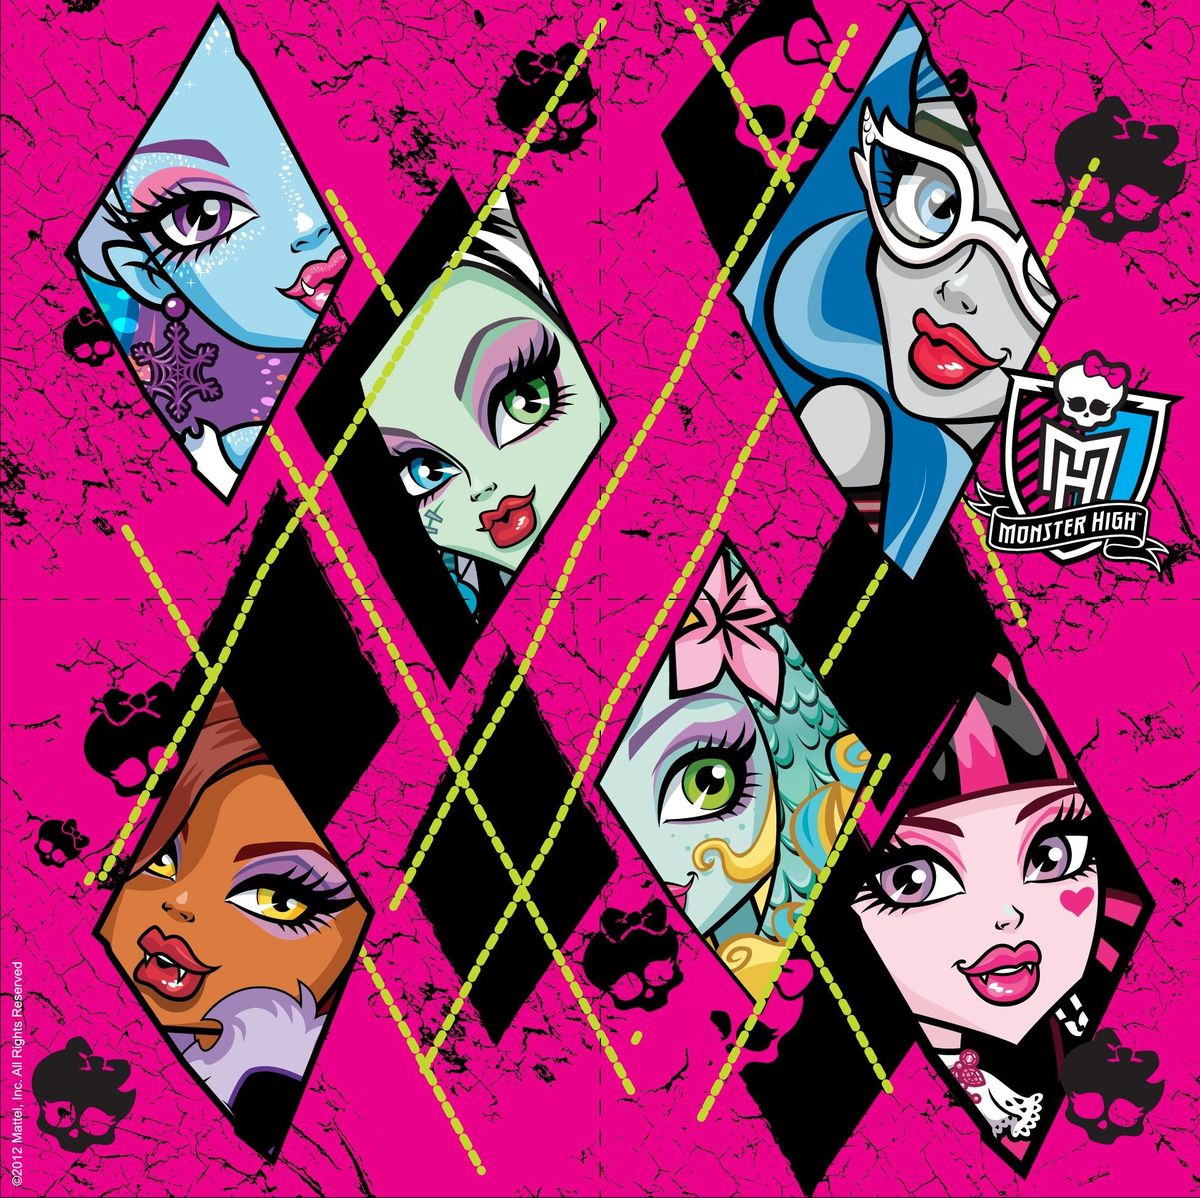 Monster High Набор салфеток 20 шт росмэн набор наклеек 1 monster high